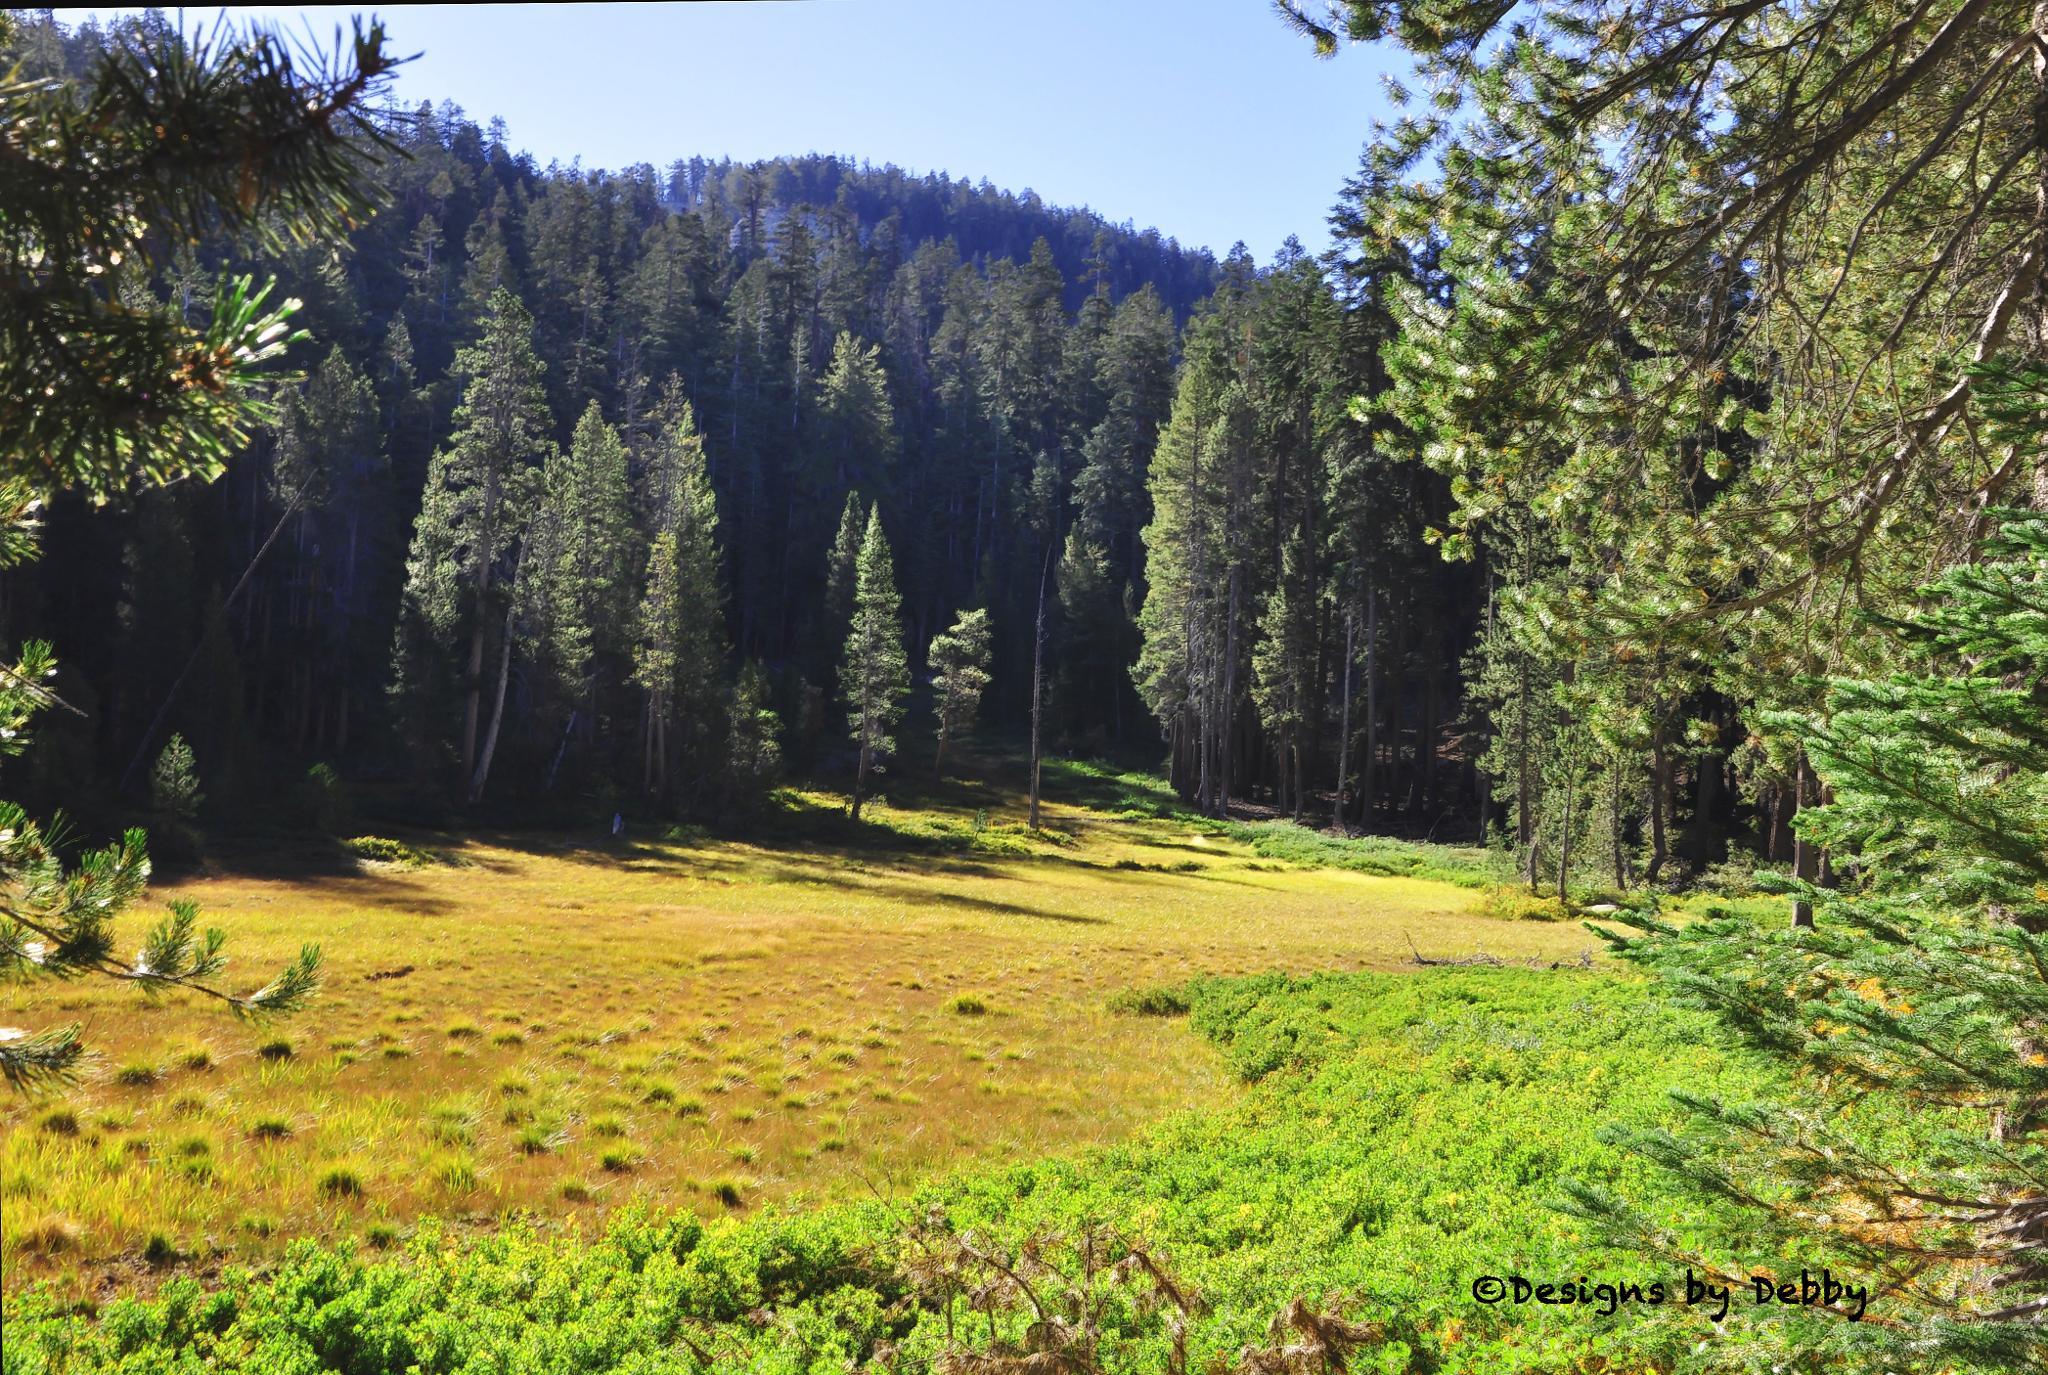 the Meadow by Debby Pueschel